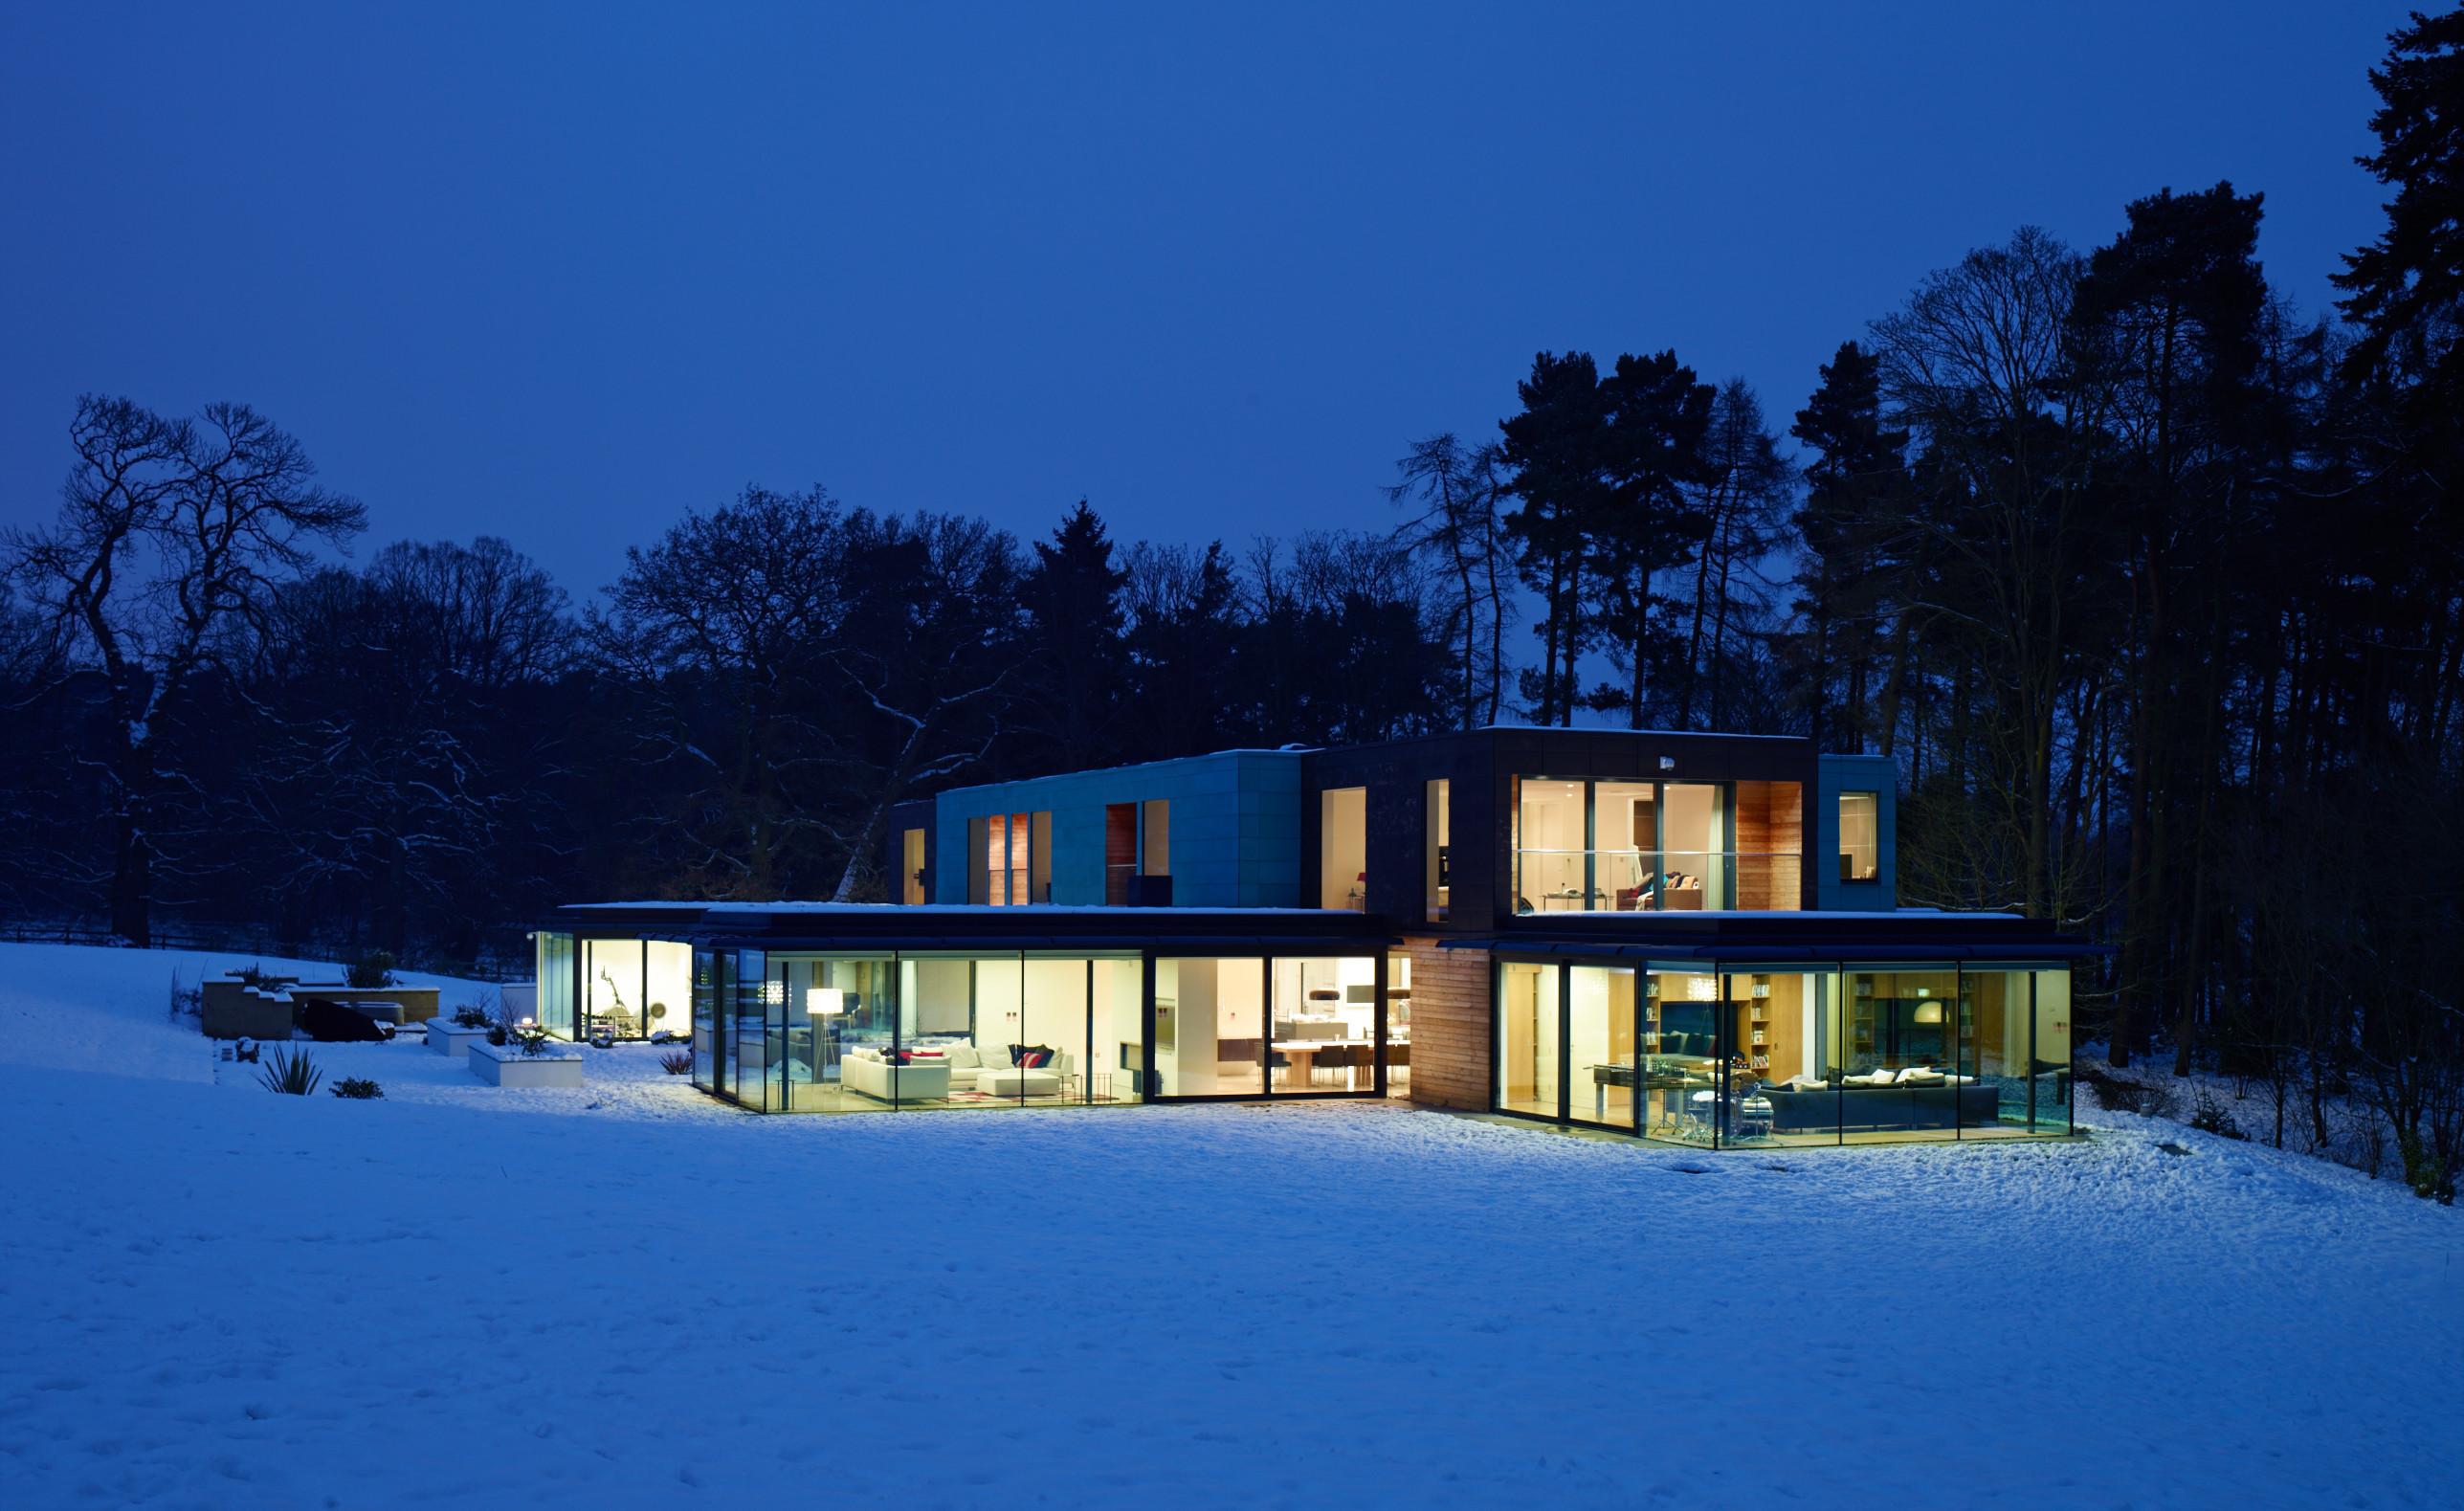 stockgrove house buckinghamshire nicolas tye architects. Black Bedroom Furniture Sets. Home Design Ideas